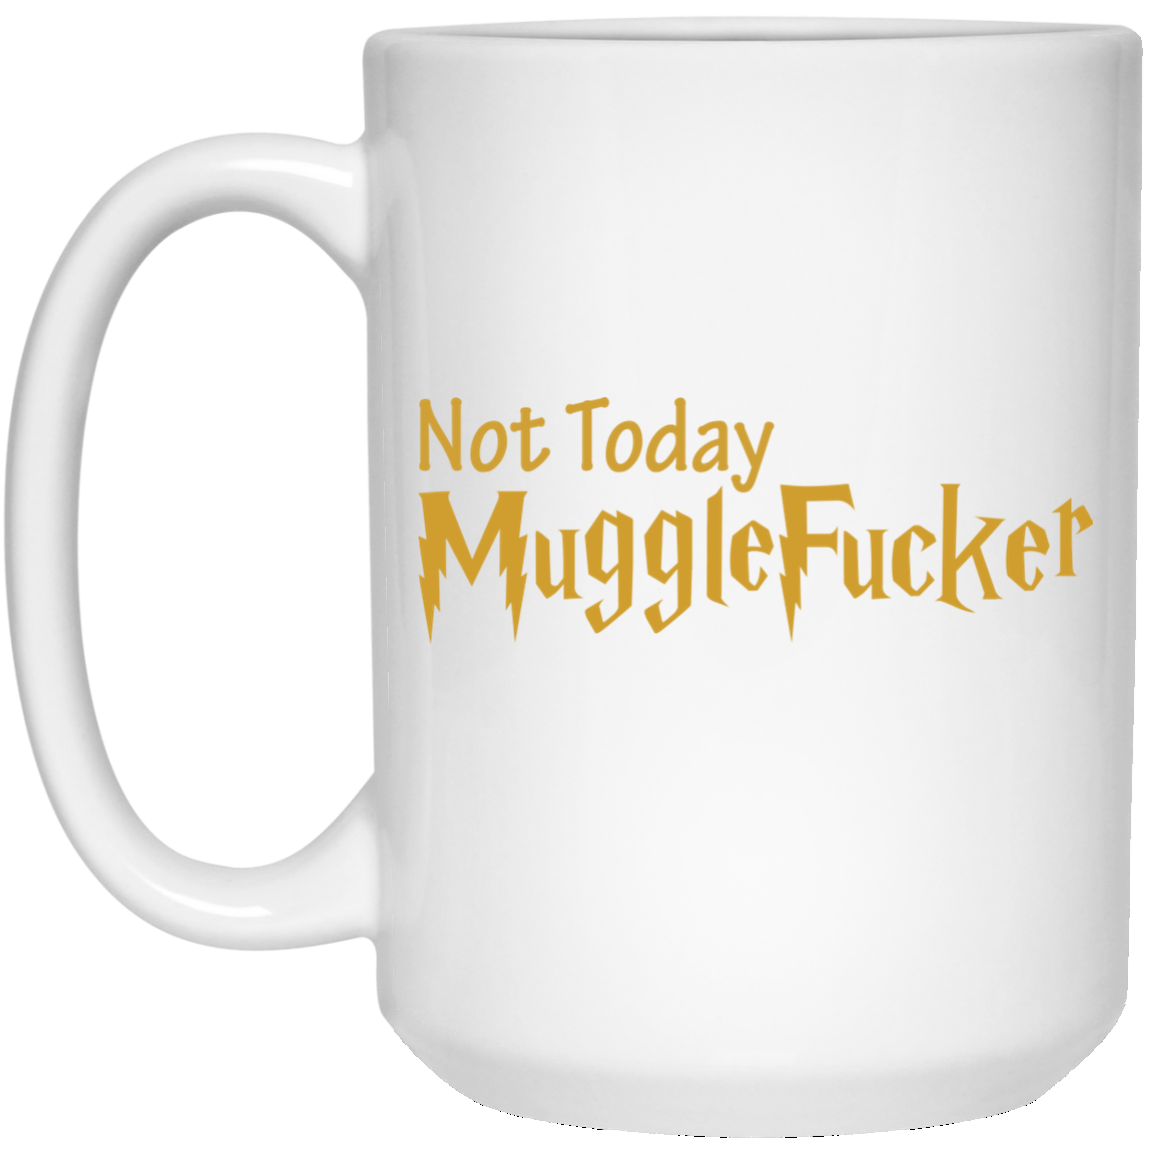 image 25 - Harry Potter: Not Today Mugglefucker mug